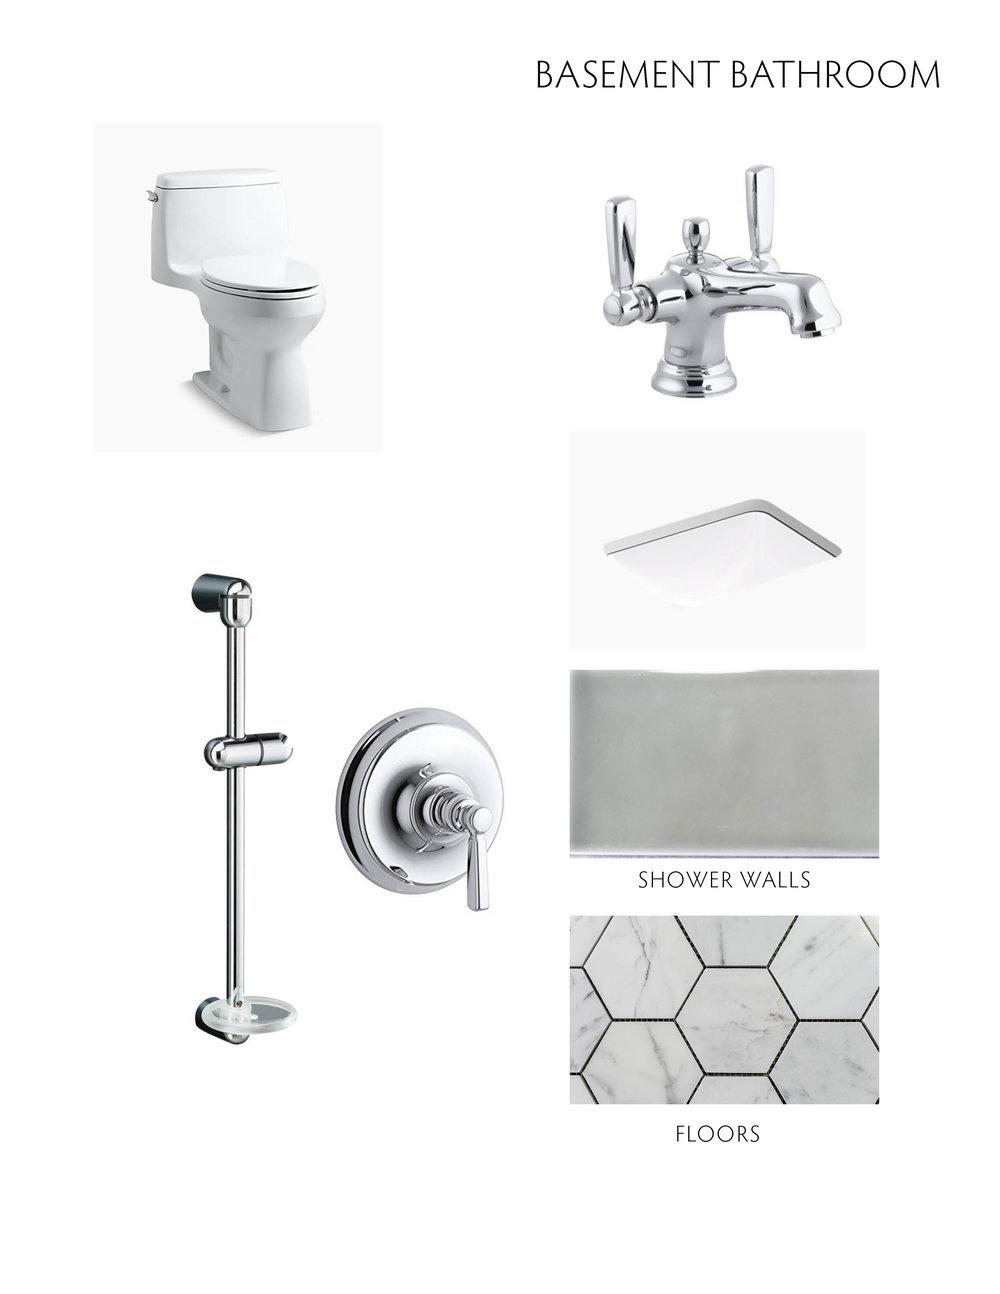 Potomac Basement Bathroom.jpg